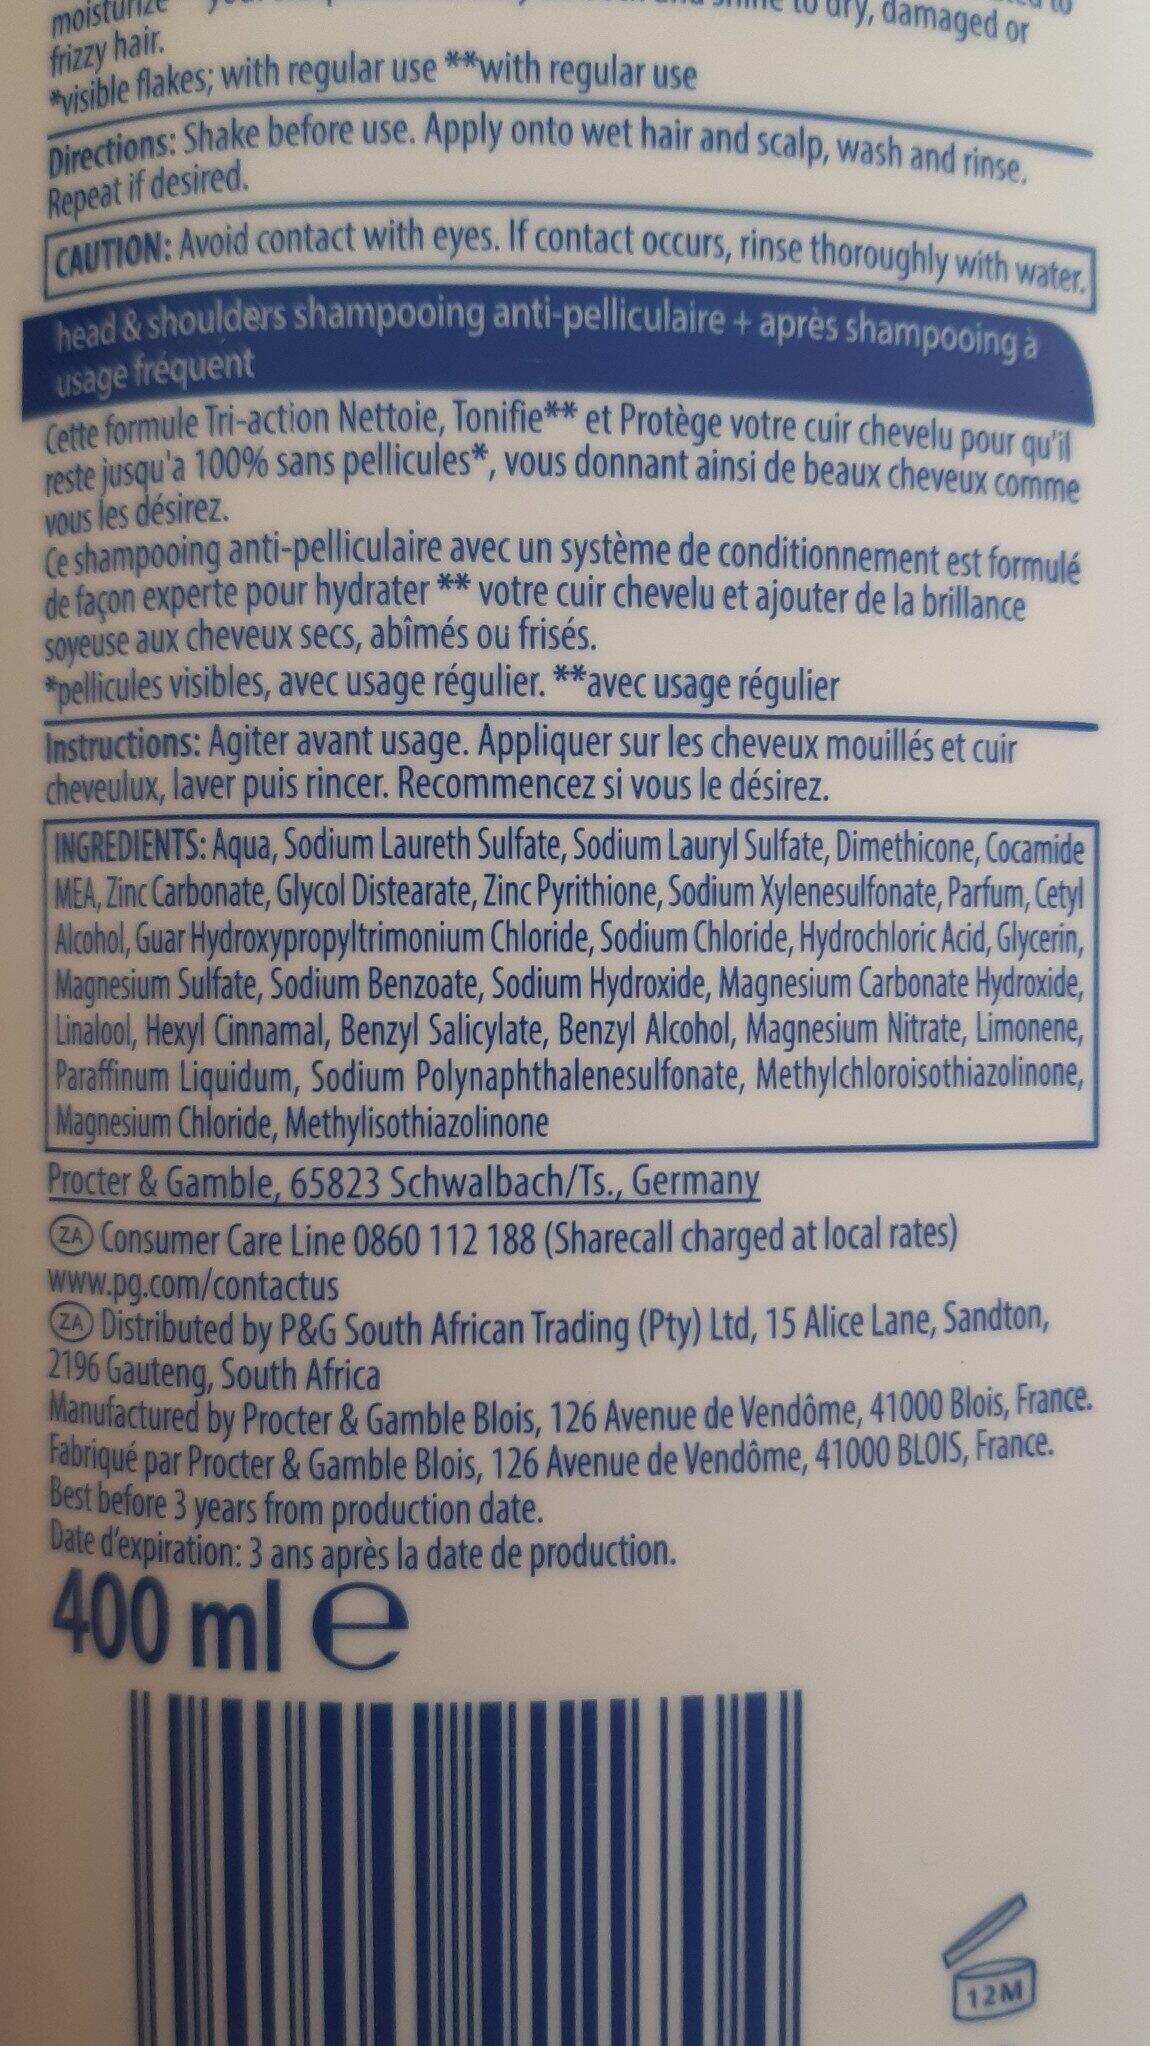 Head & Shoukders 2 in 1 Shampoo - Ingredients - en